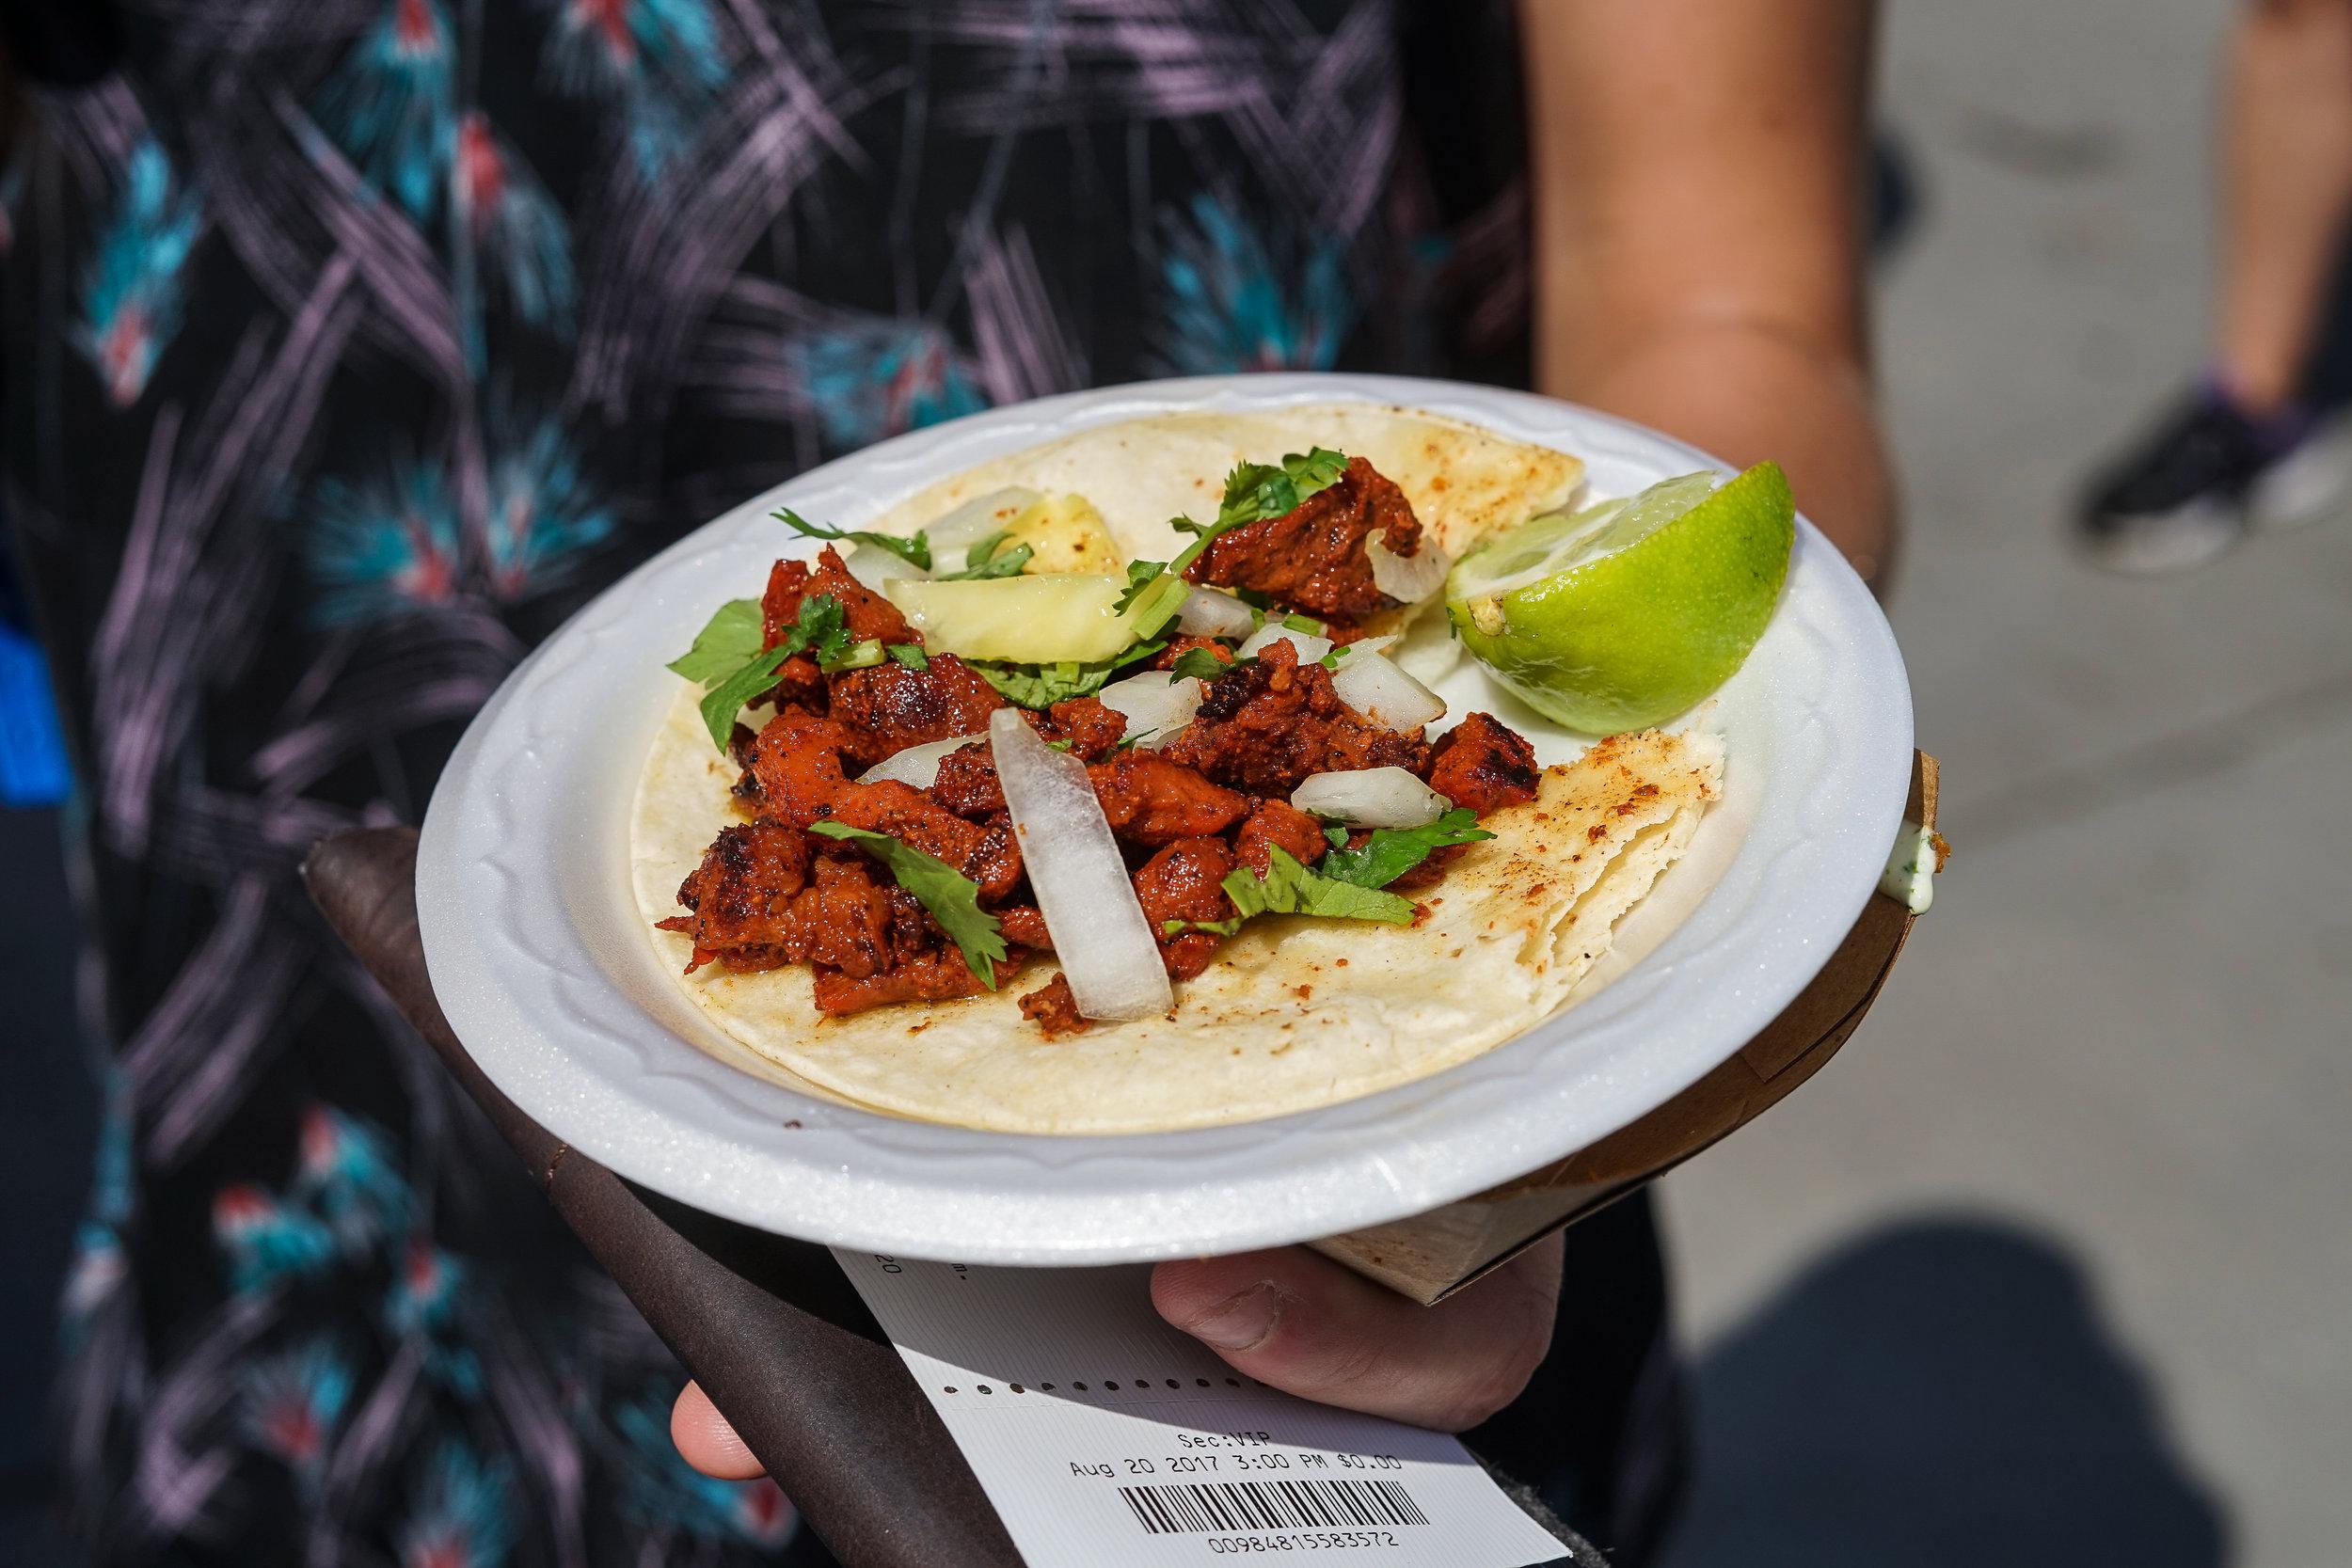 One of the many tasty tacos at Tacolandia. (Photo Credit: Robert Castro)